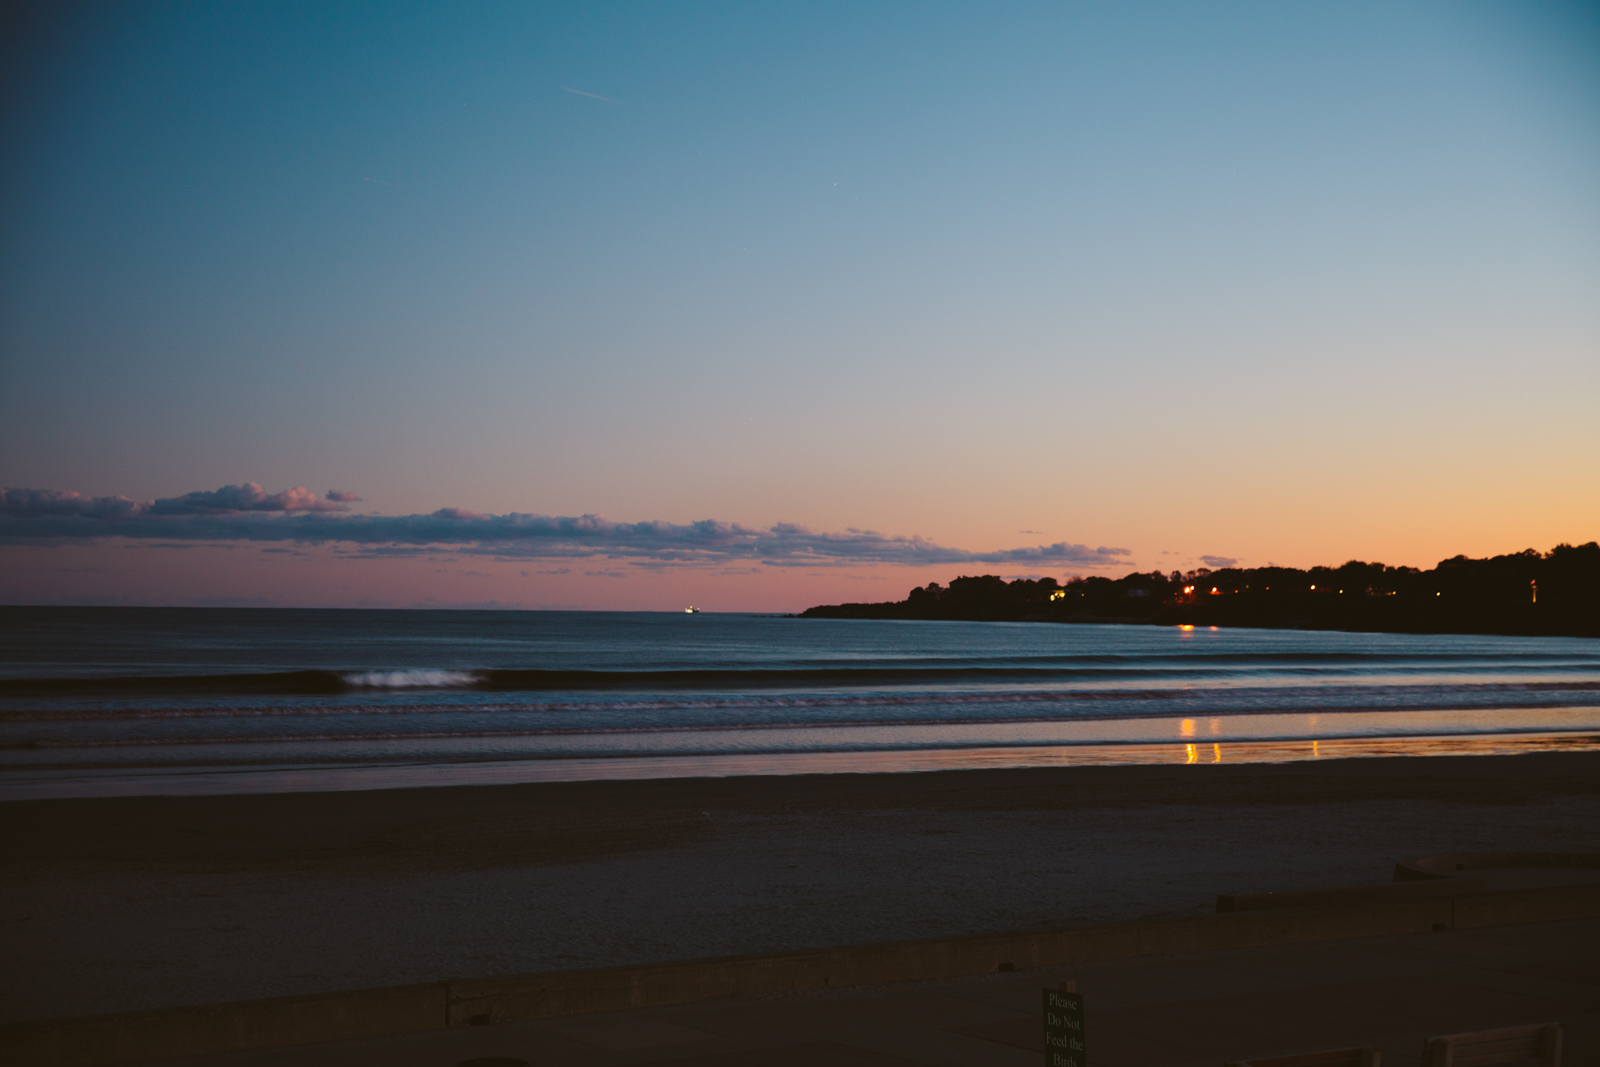 Eastons-Beach-Rotunda-Ballroom-Wedding-Newport-Rhode-Island-PhotographybyAmandaMorgan-118.jpg